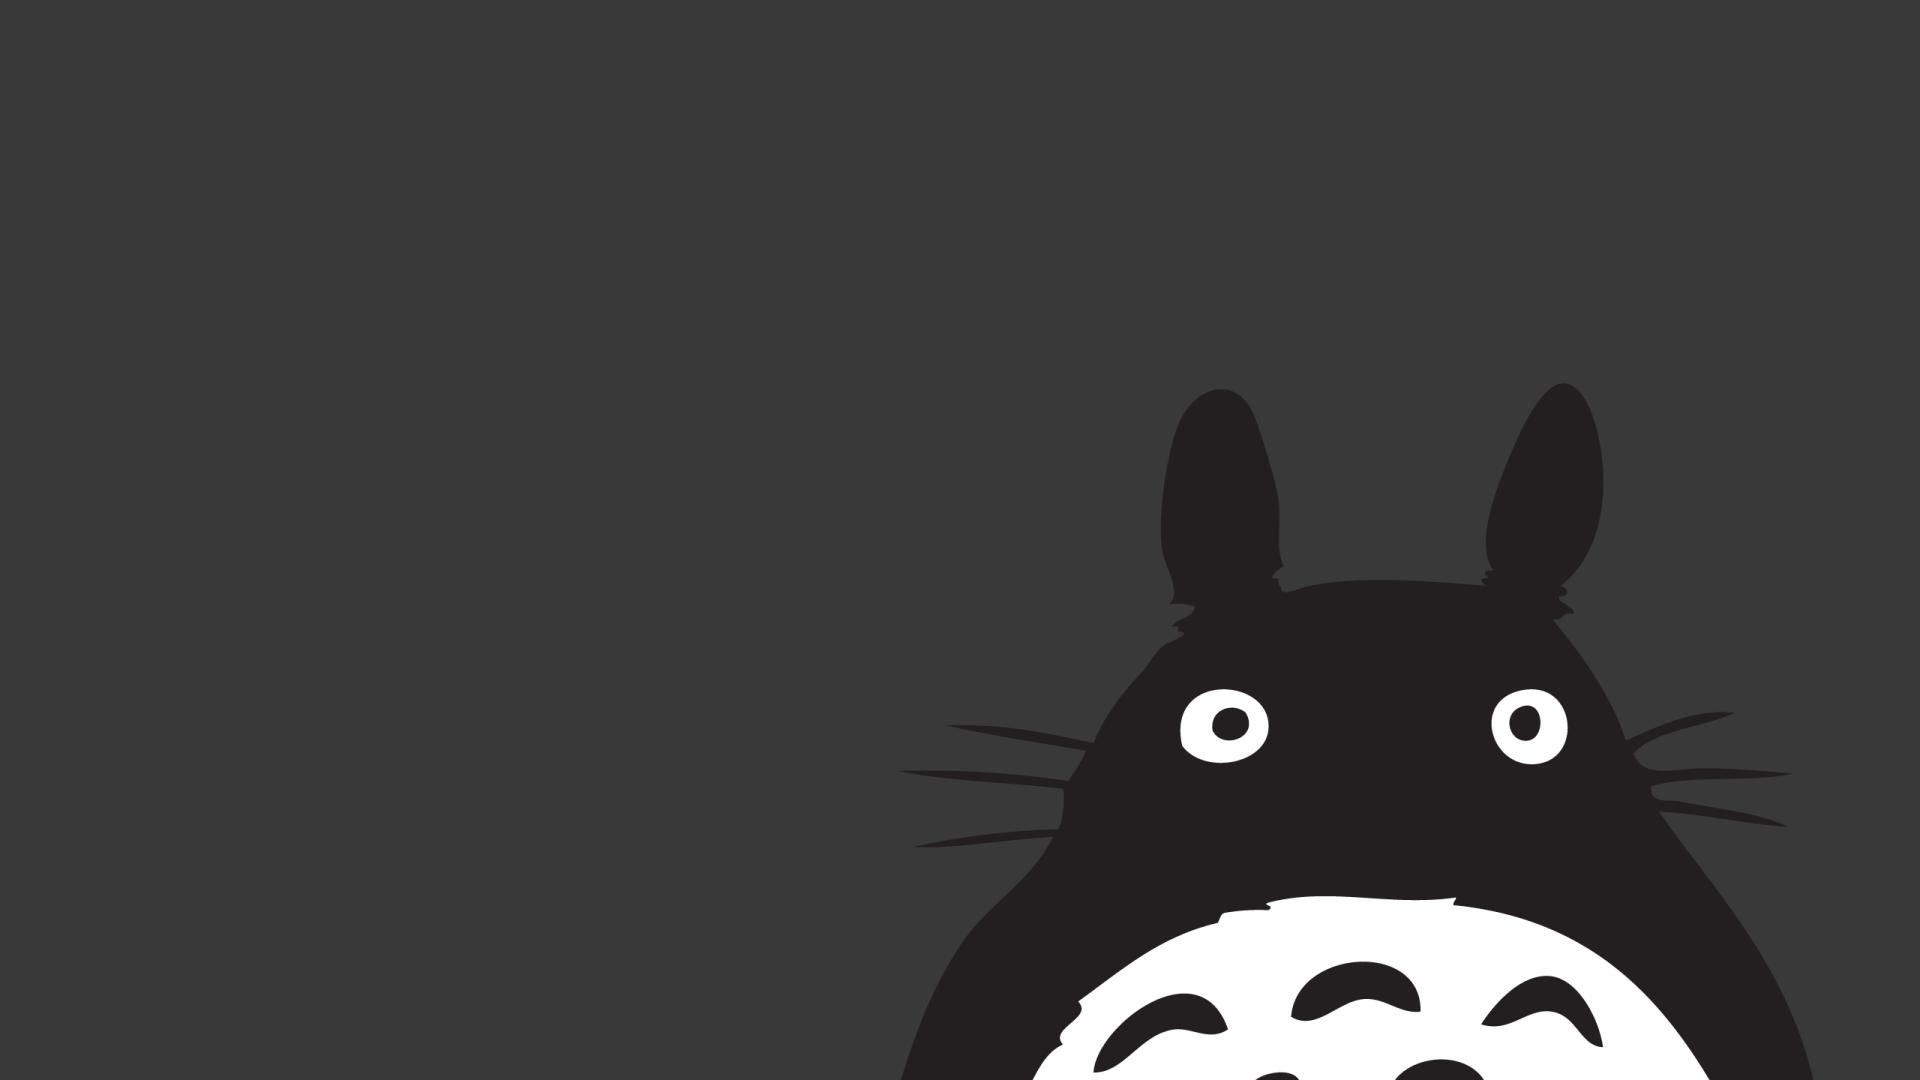 My Neighbor Totoro 2048x1152 Resolution